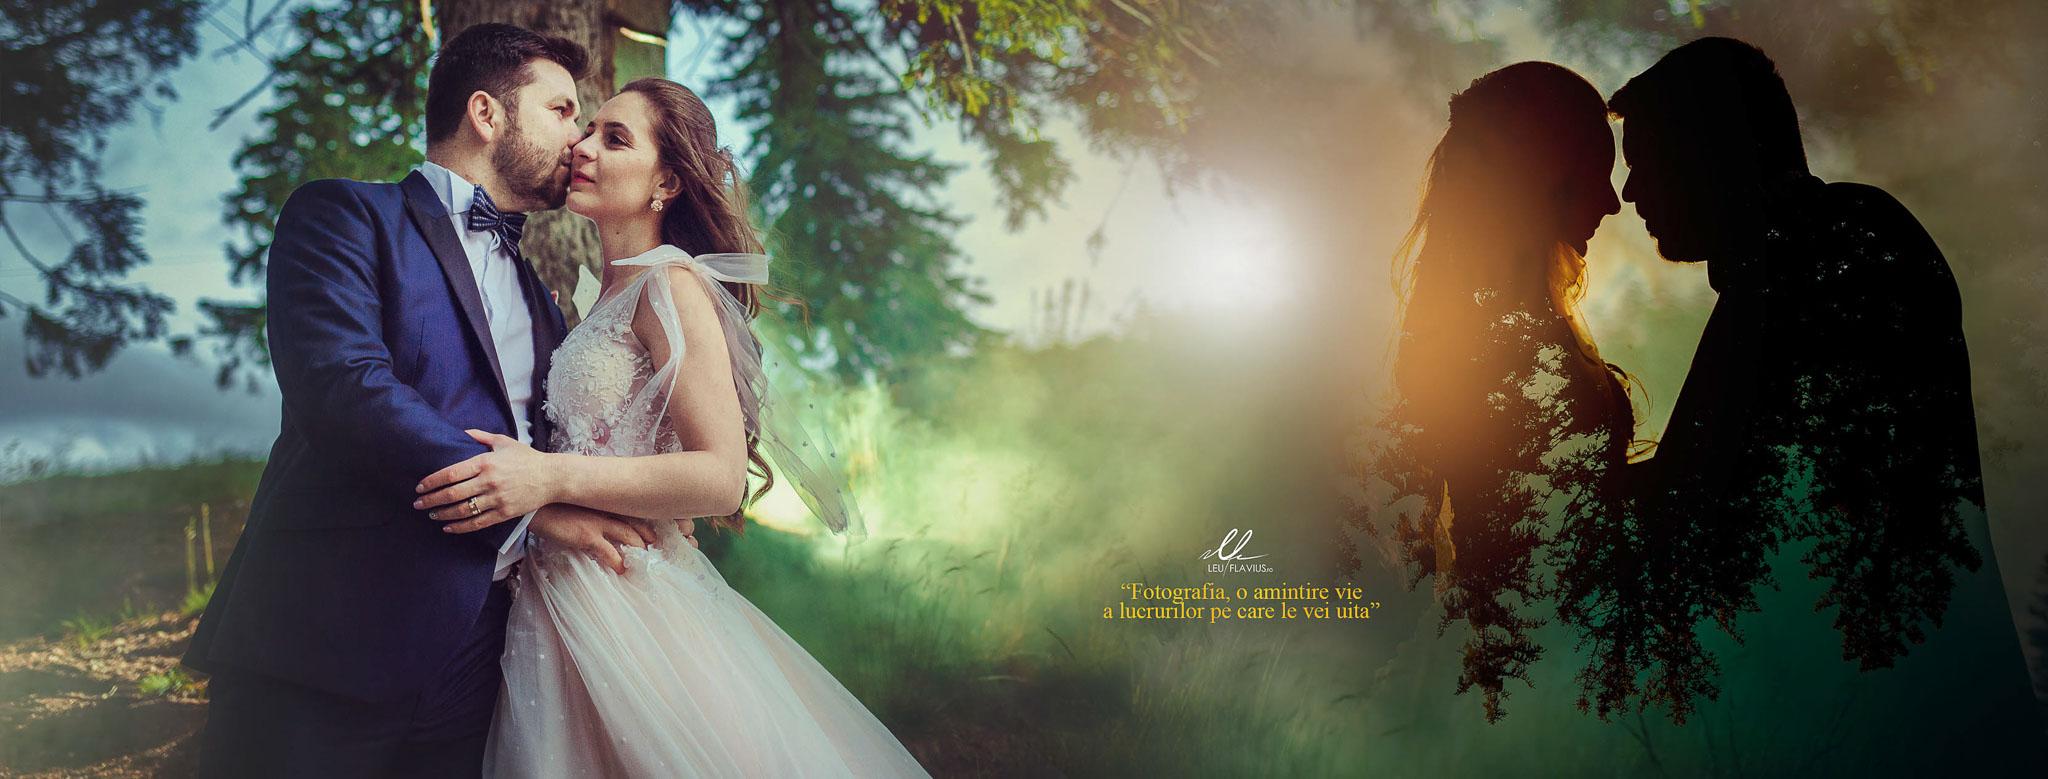 Cover - Trash the Dress - Cosmina si Ionut